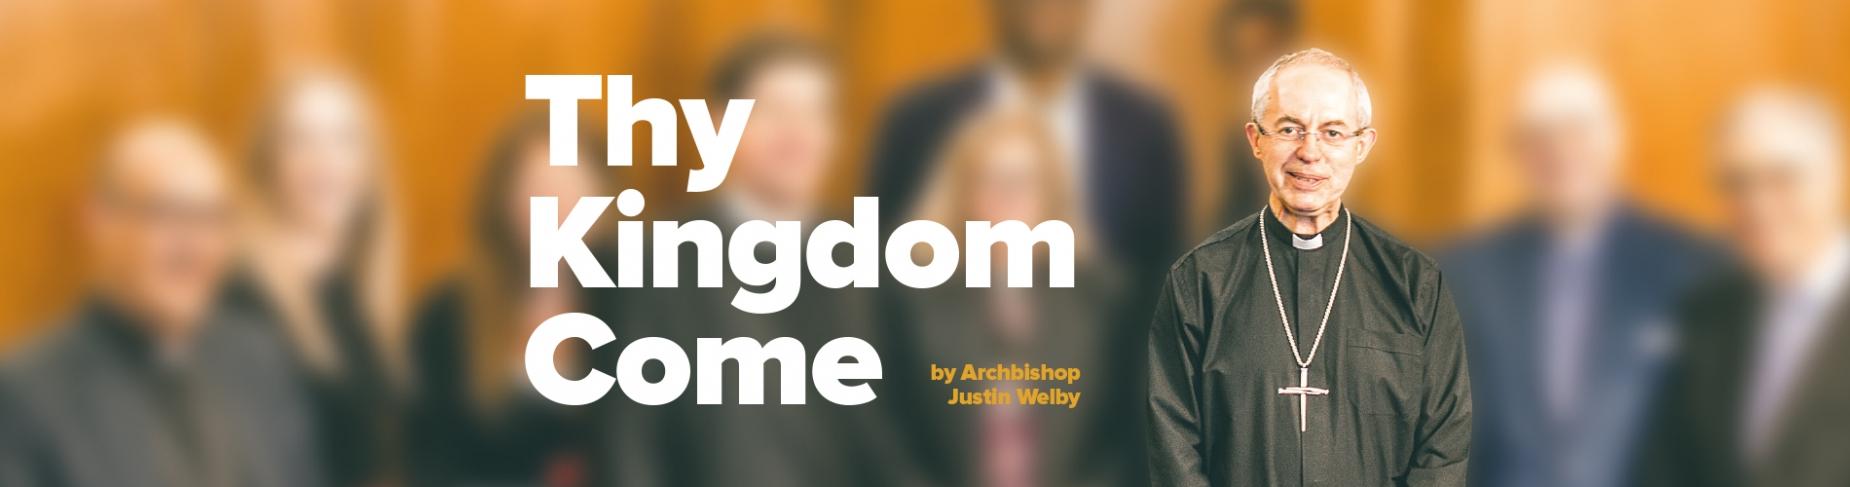 Thy Kingdom Come - Archbishop Justin Welby